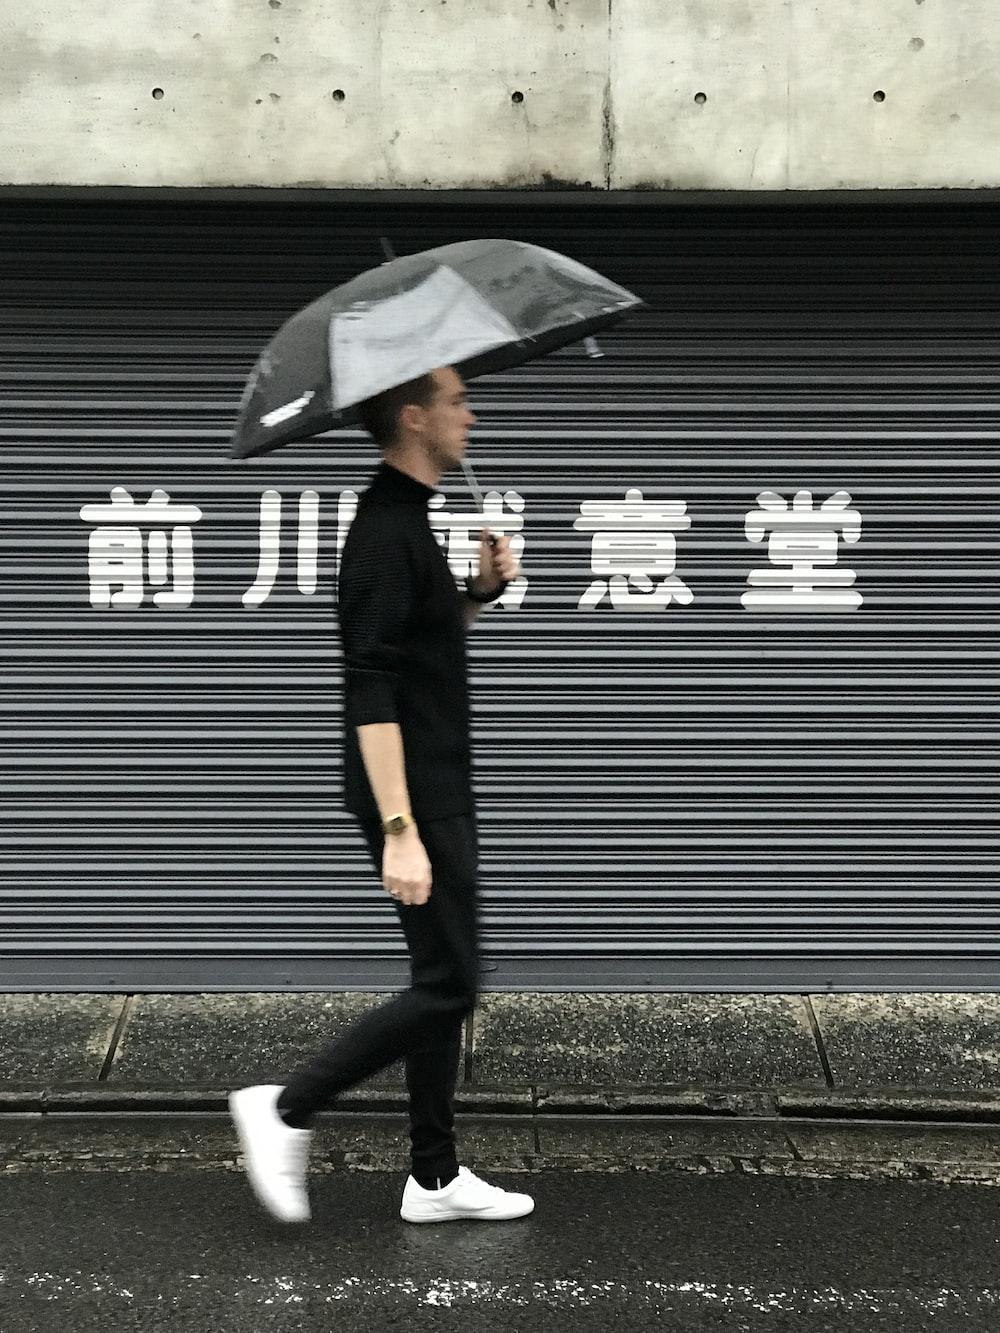 woman in black coat and black pants holding umbrella walking on sidewalk during daytime